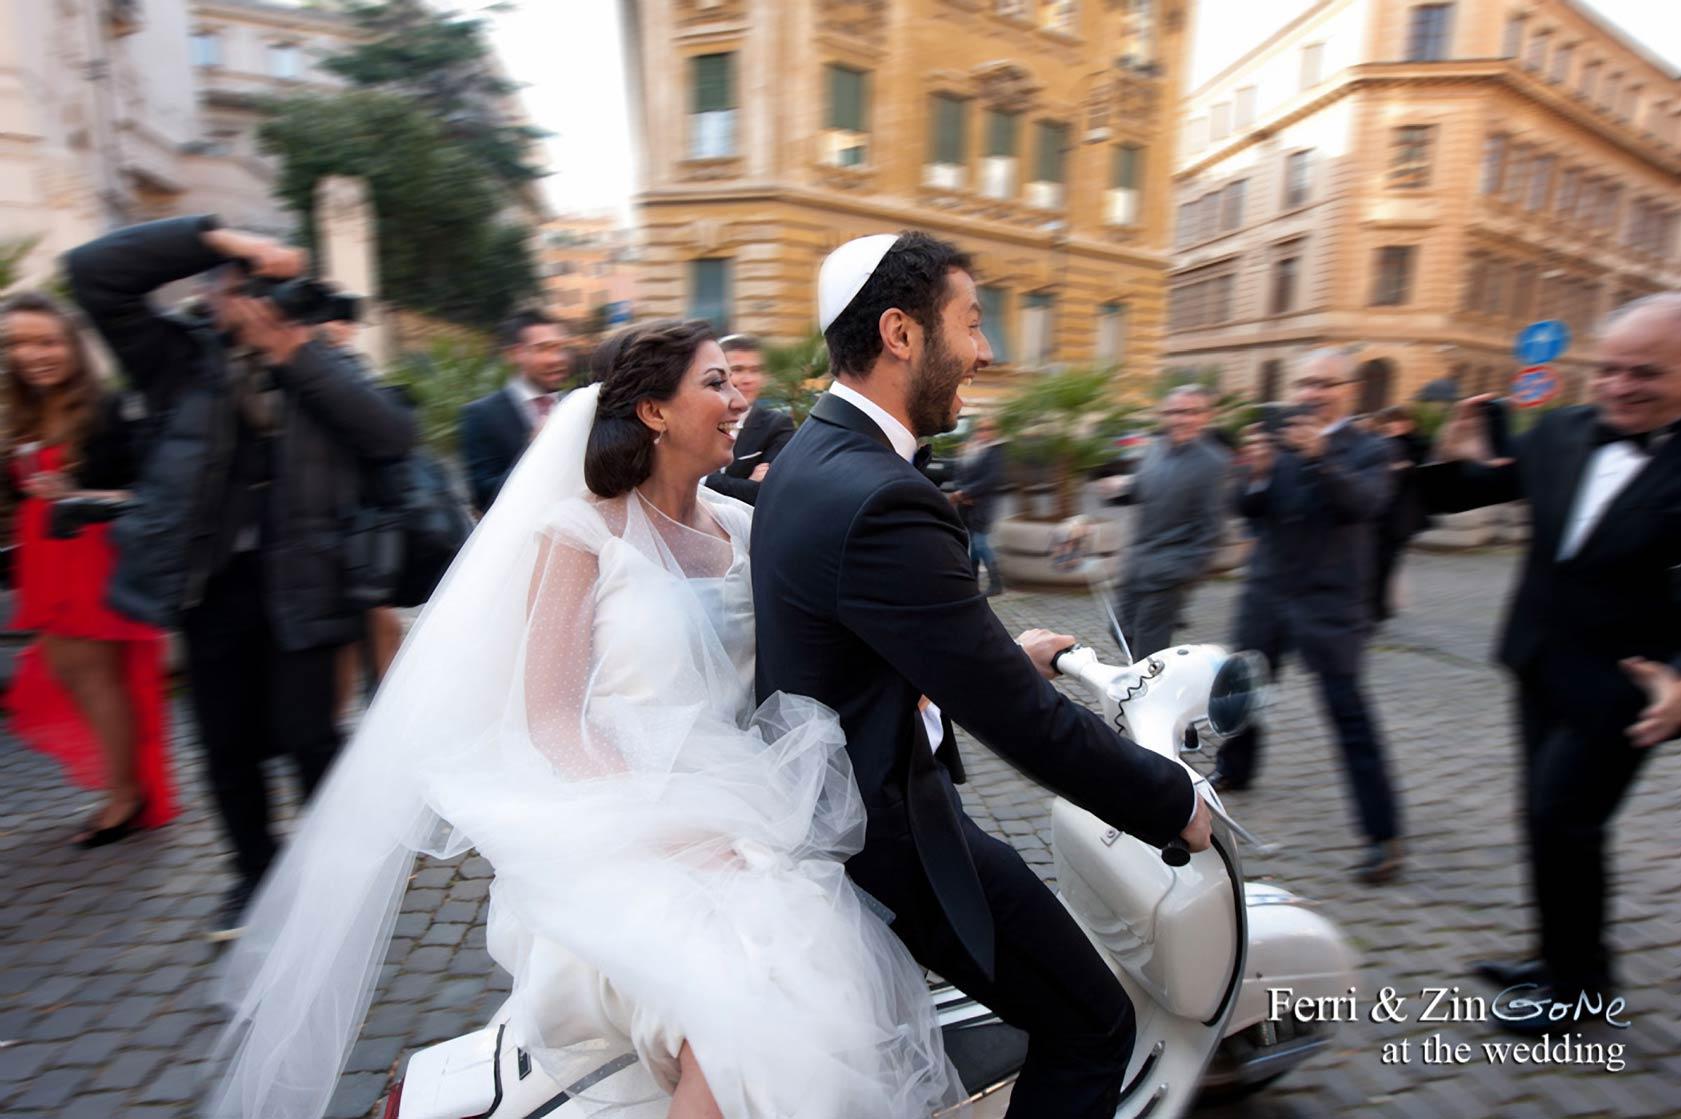 Jewish wedding in Italy